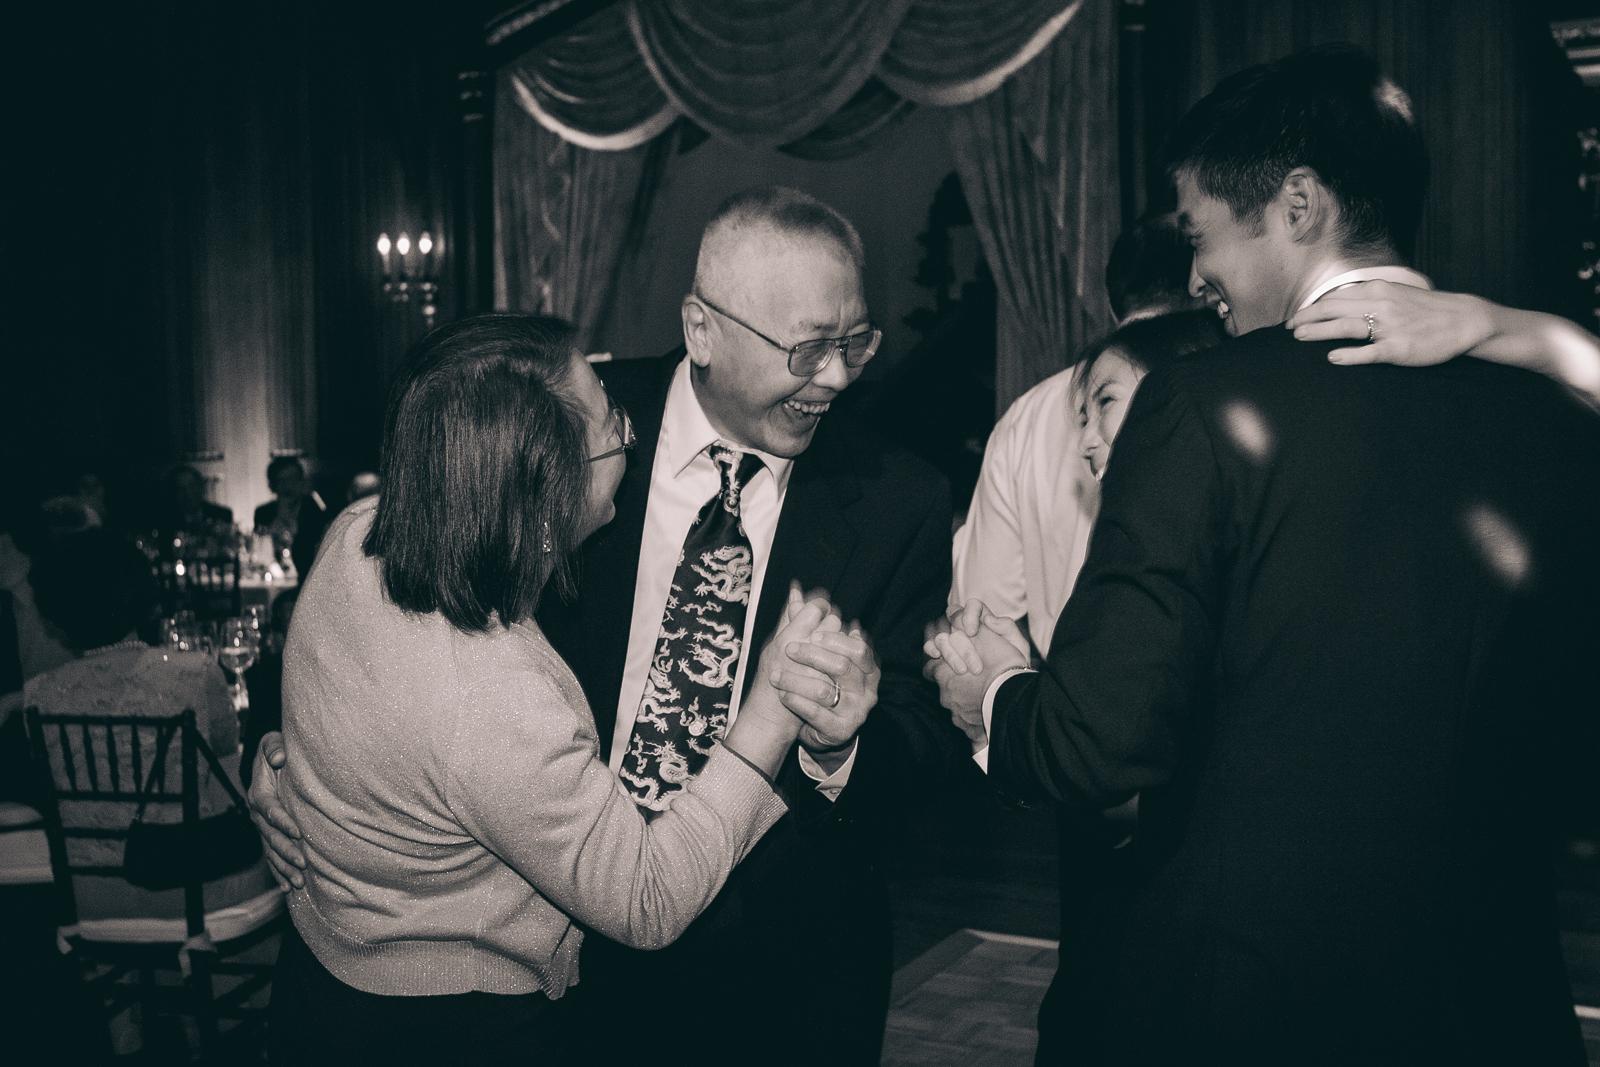 kohl_manison_wedding_photography_sarah_eric_ebony_siovhan_bokeh_photography_107.jpg